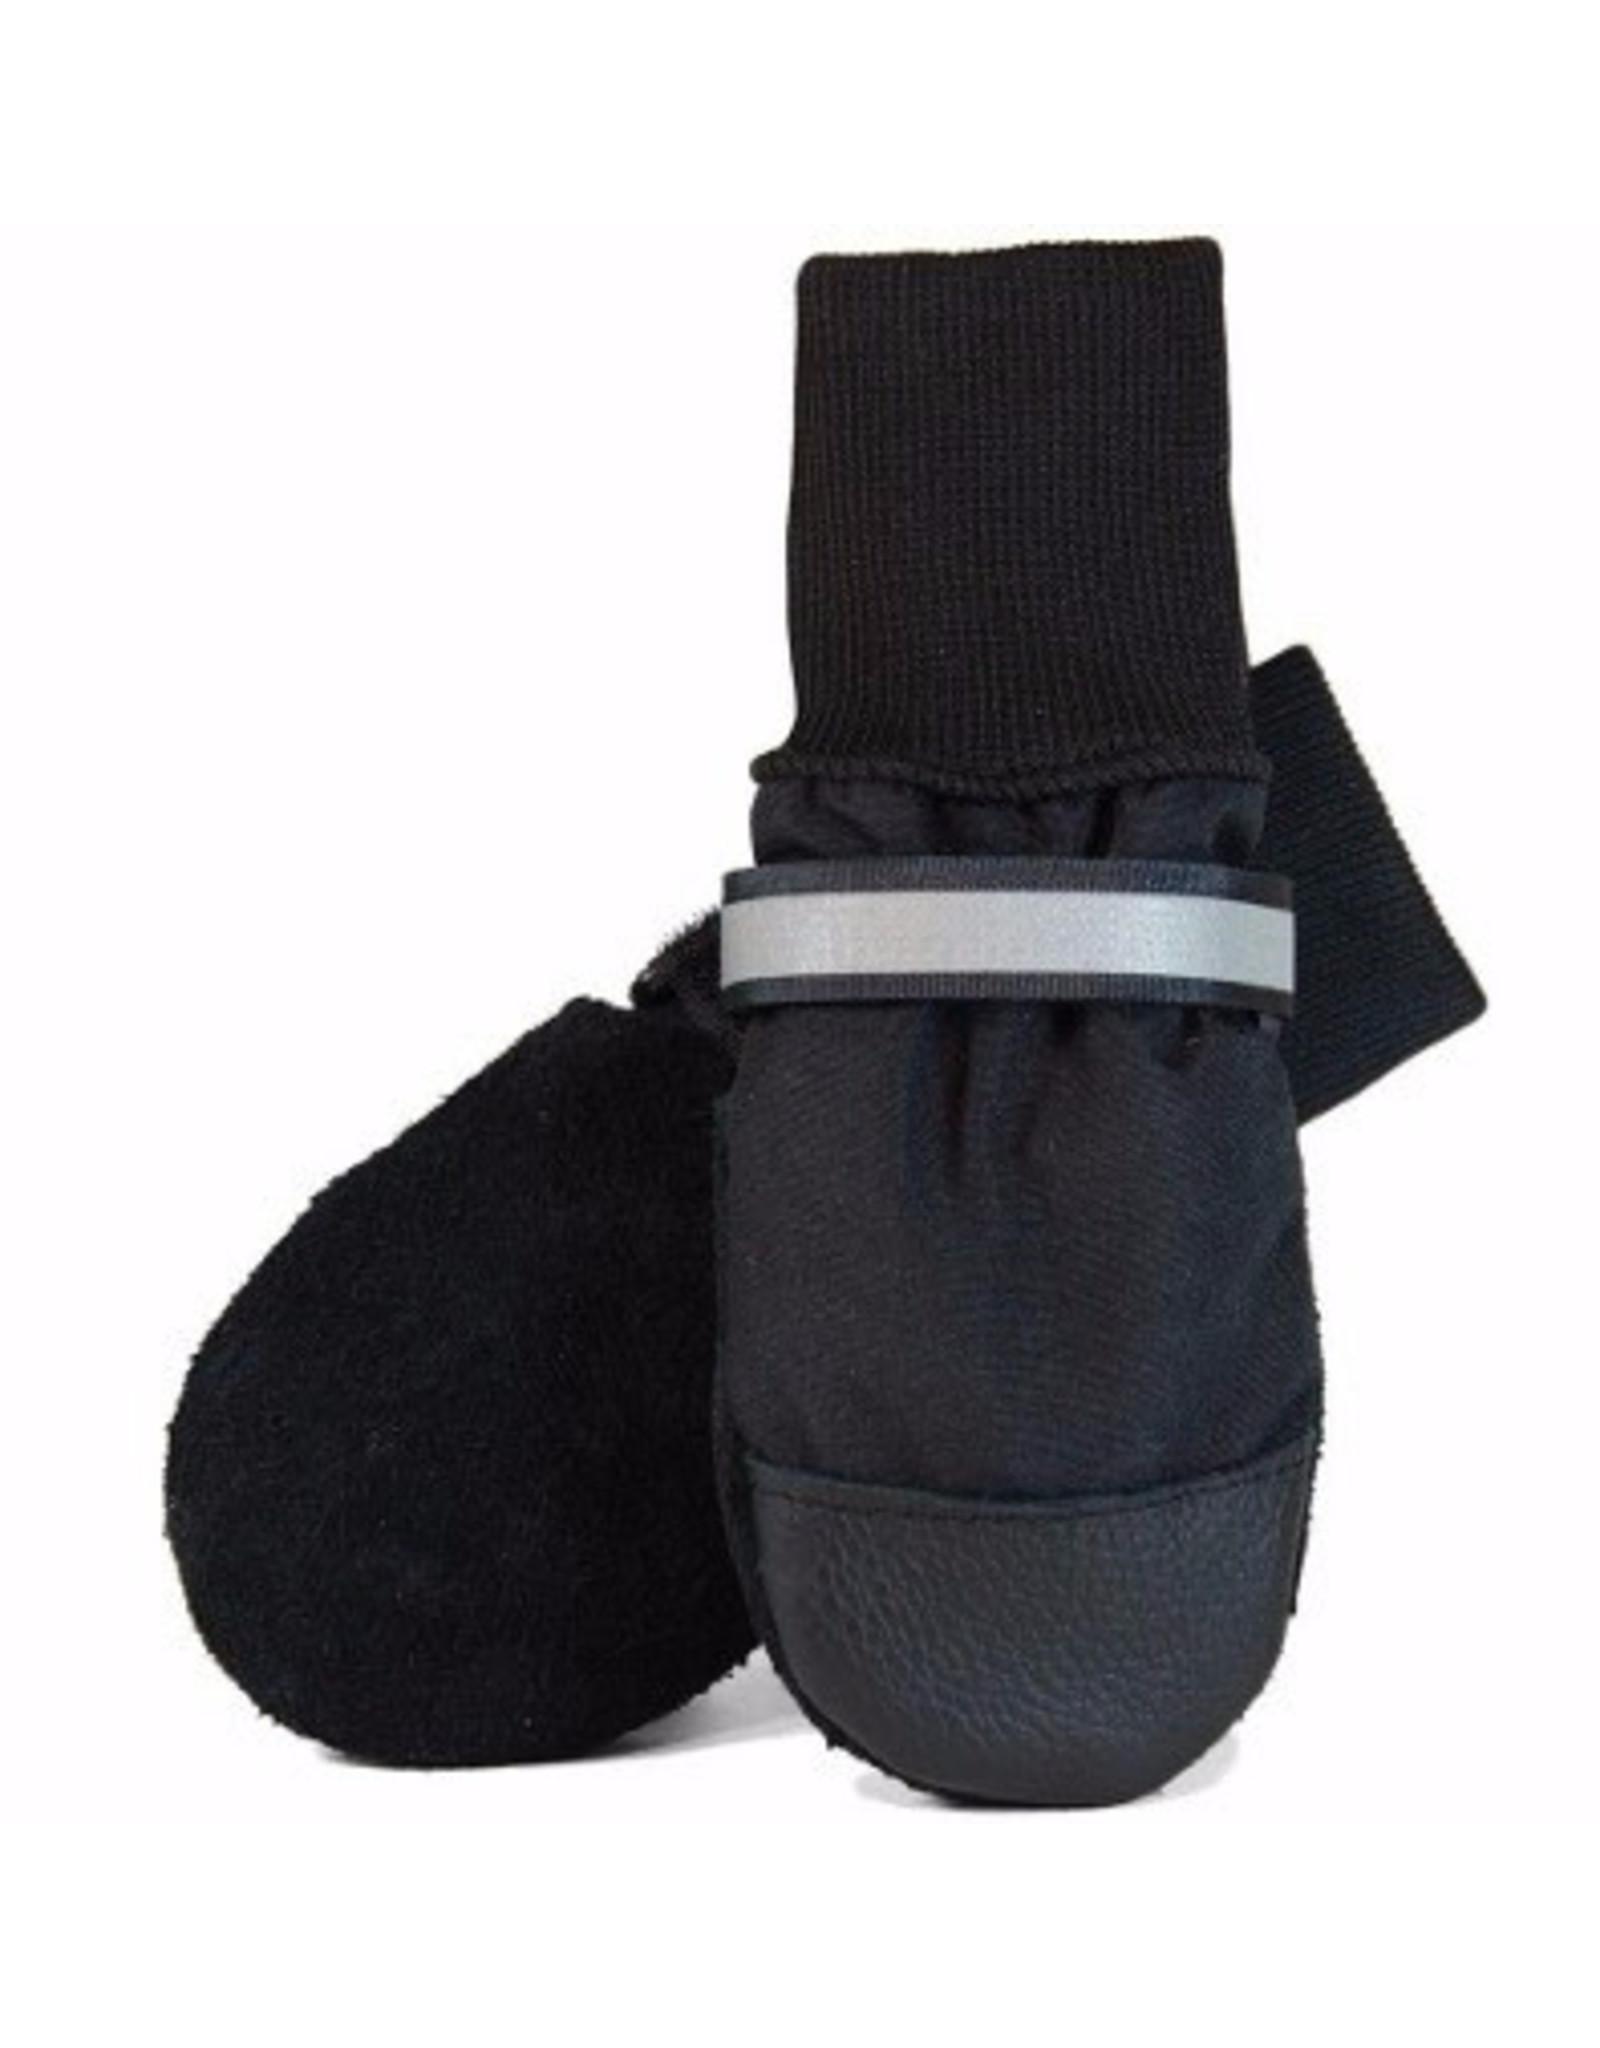 Muttluks Muttluks All-Weather Boots - Black L